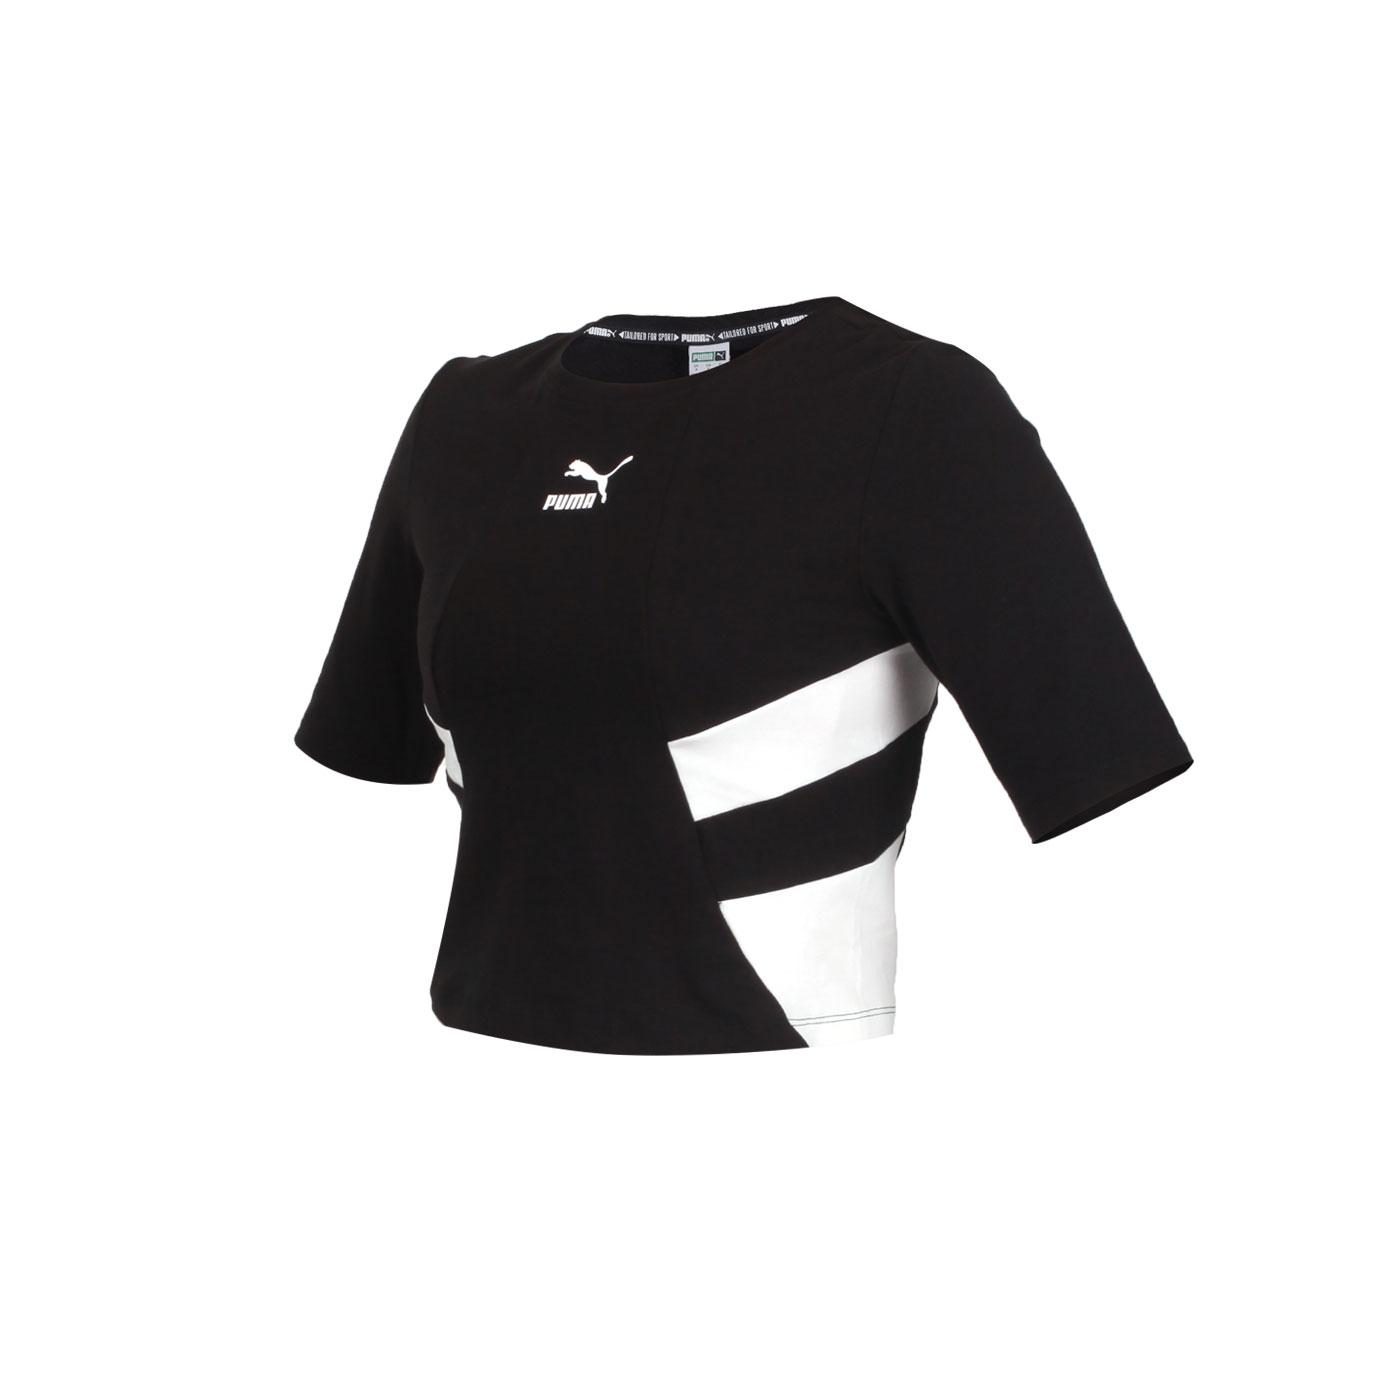 PUMA 女款流行系列TFS短版短袖T恤 59775001 - 黑白